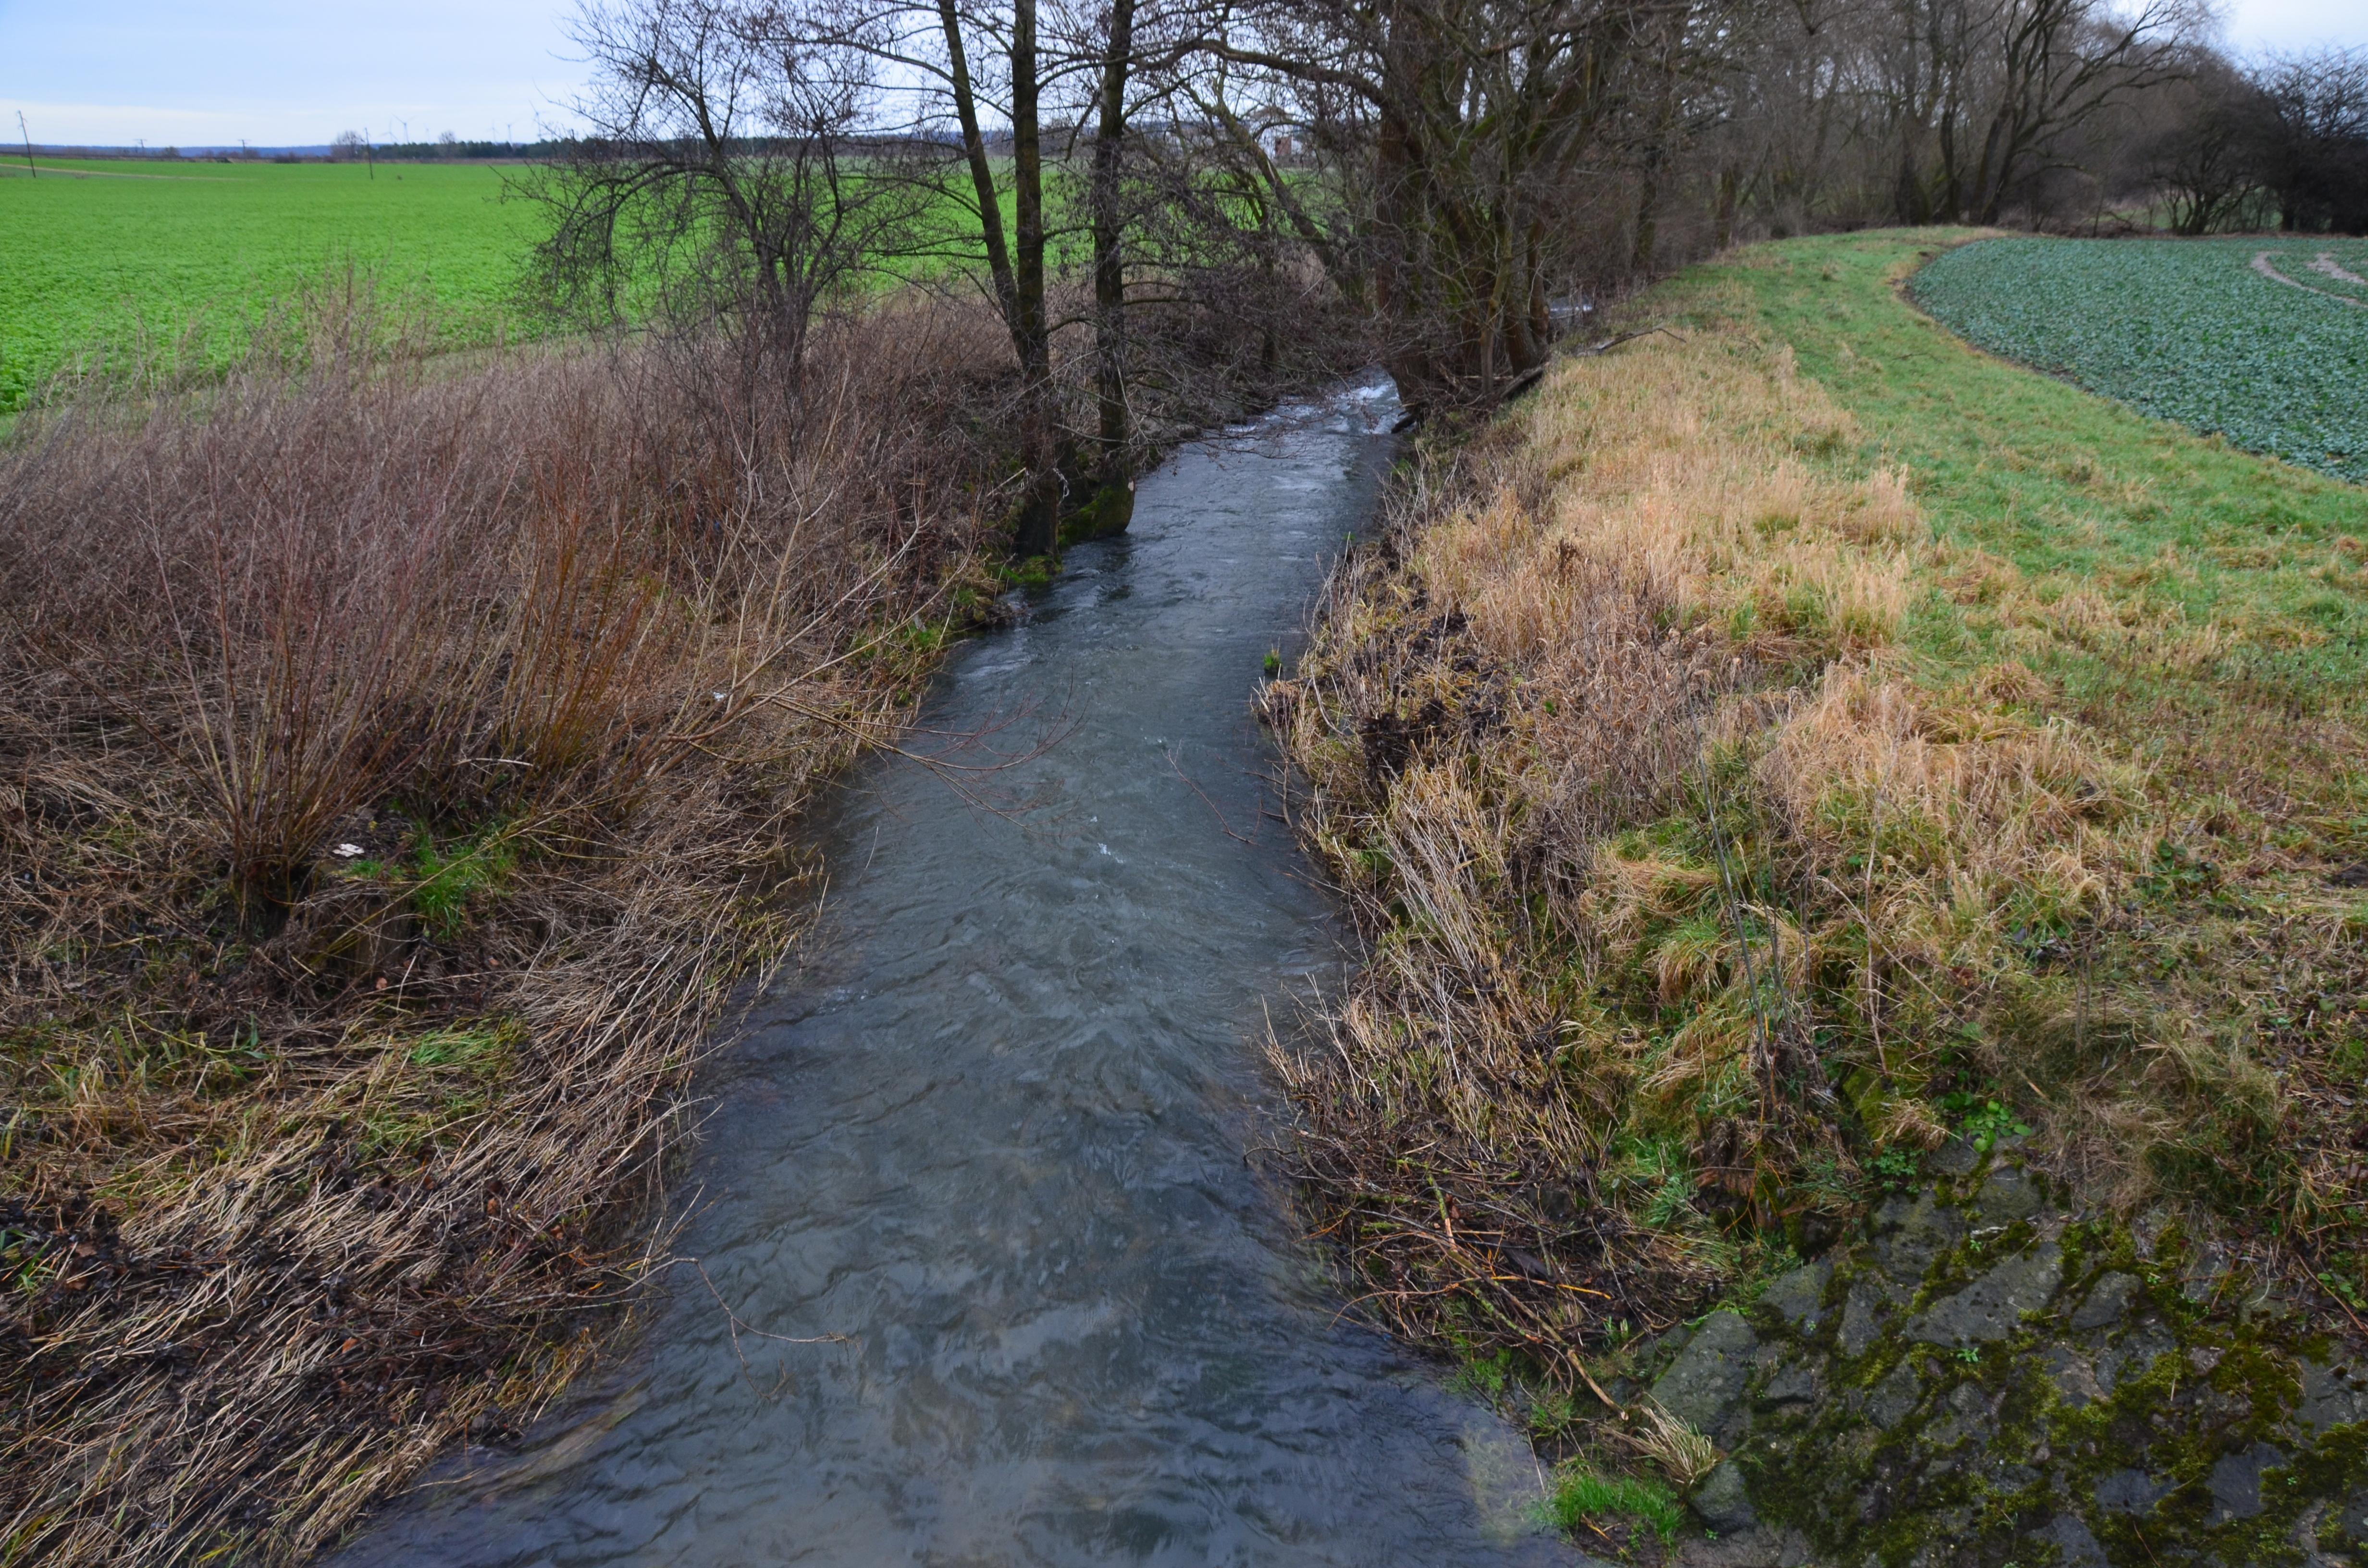 Fluss zur leine rätsel